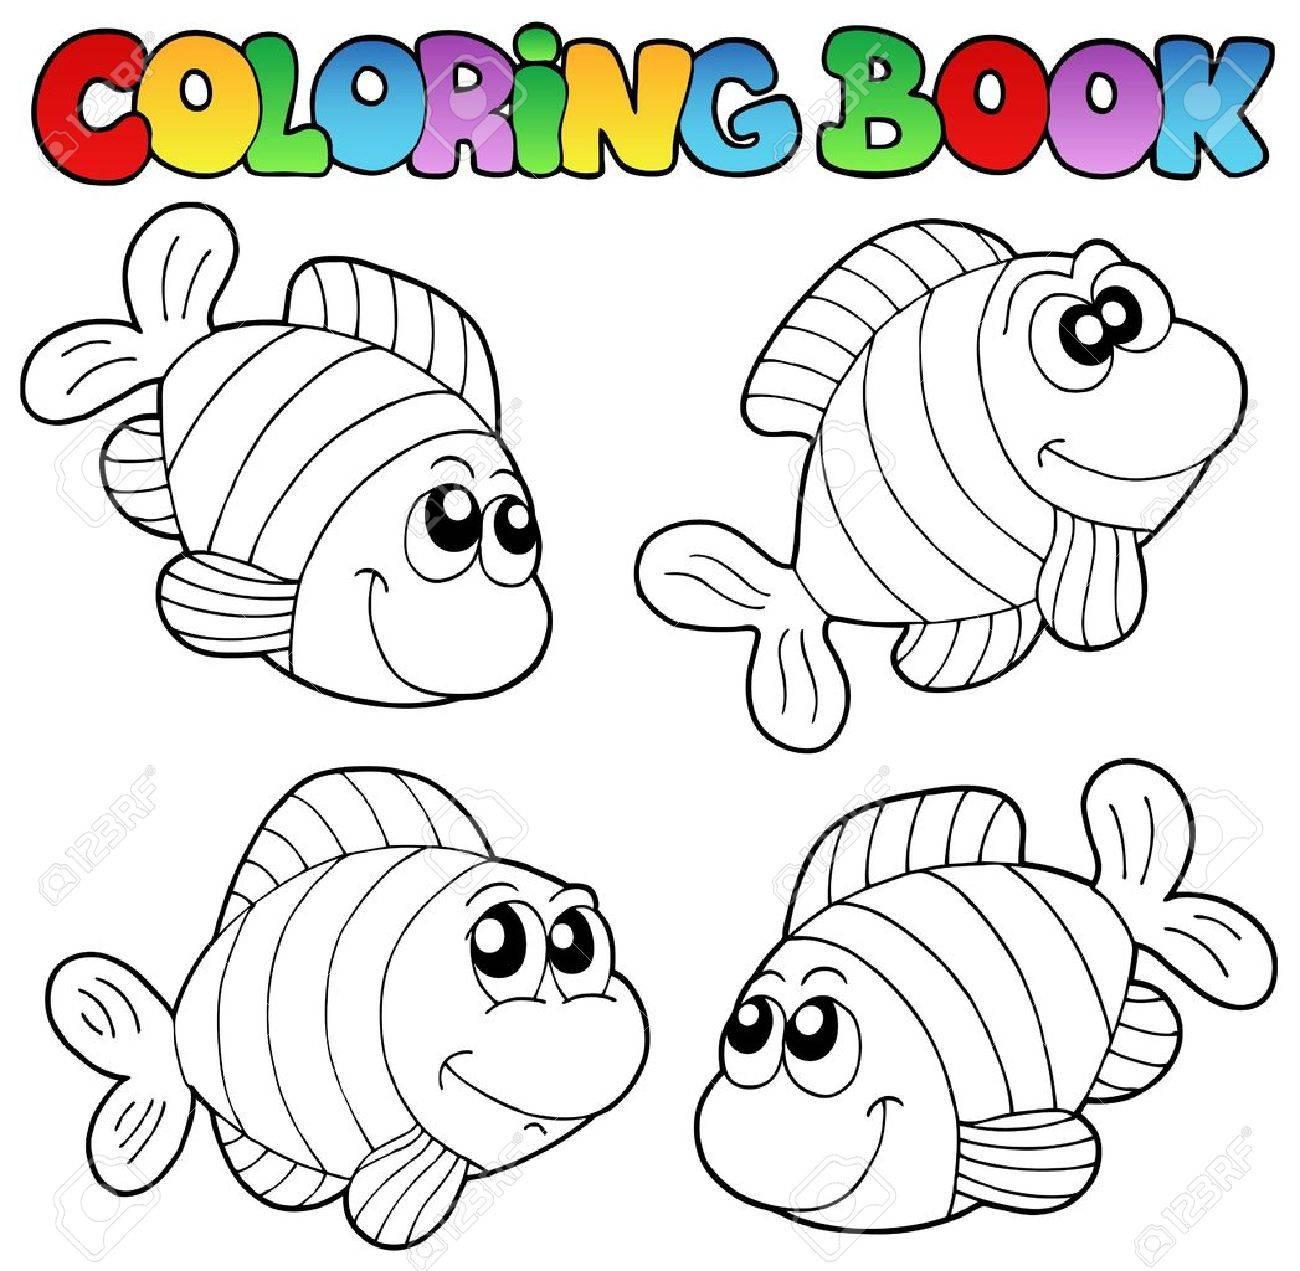 Libro Para Colorear Con Rayas Peces - Ilustración Vectorial ...